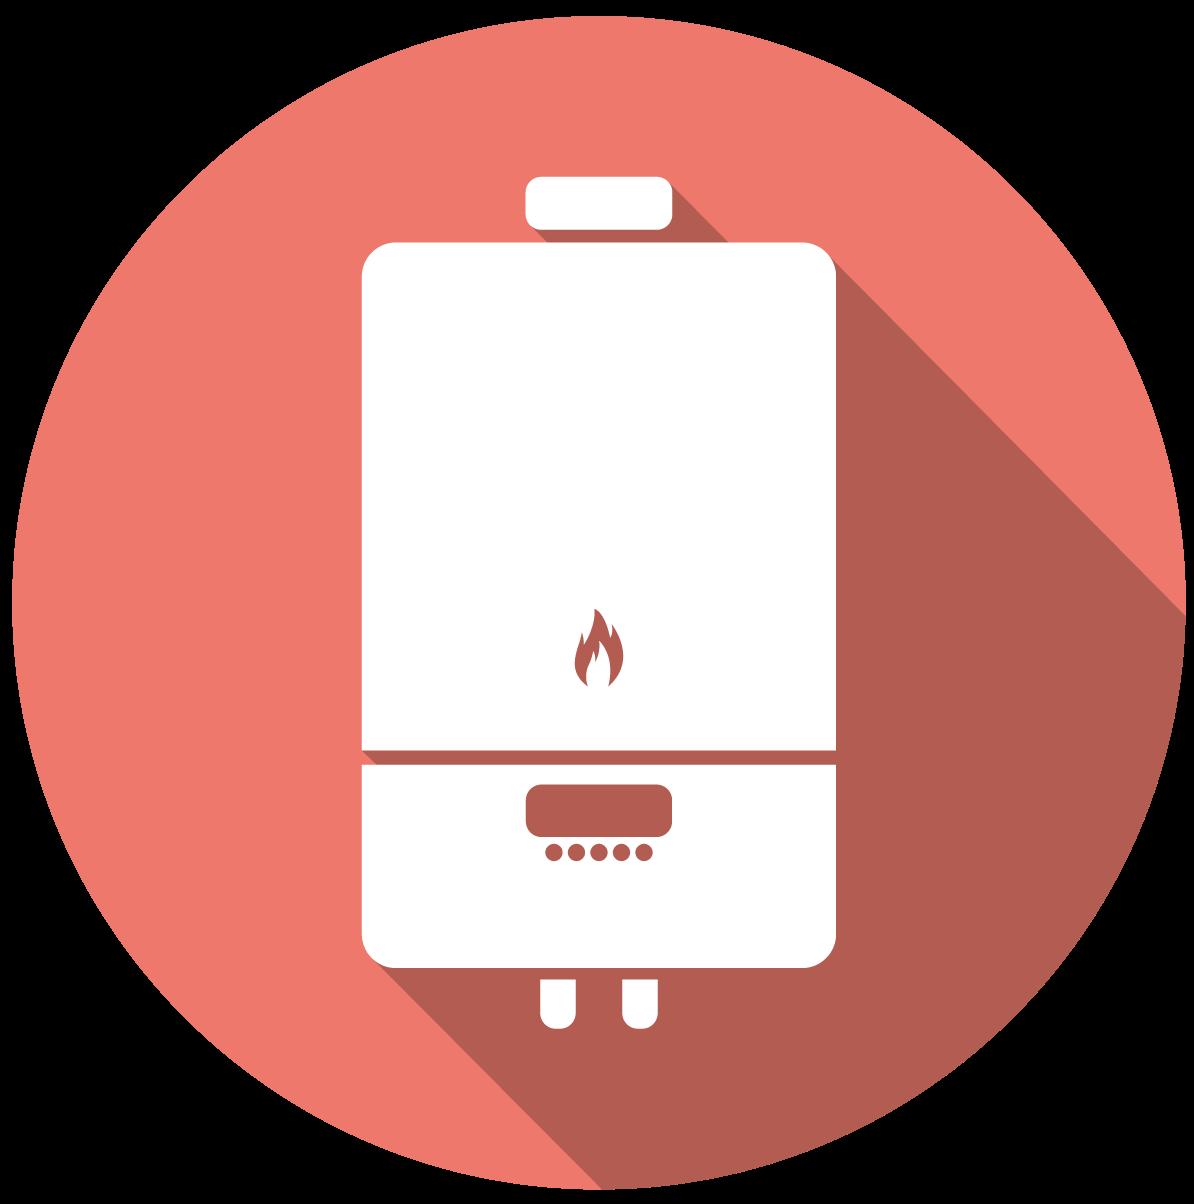 Icono de cambio de caldera